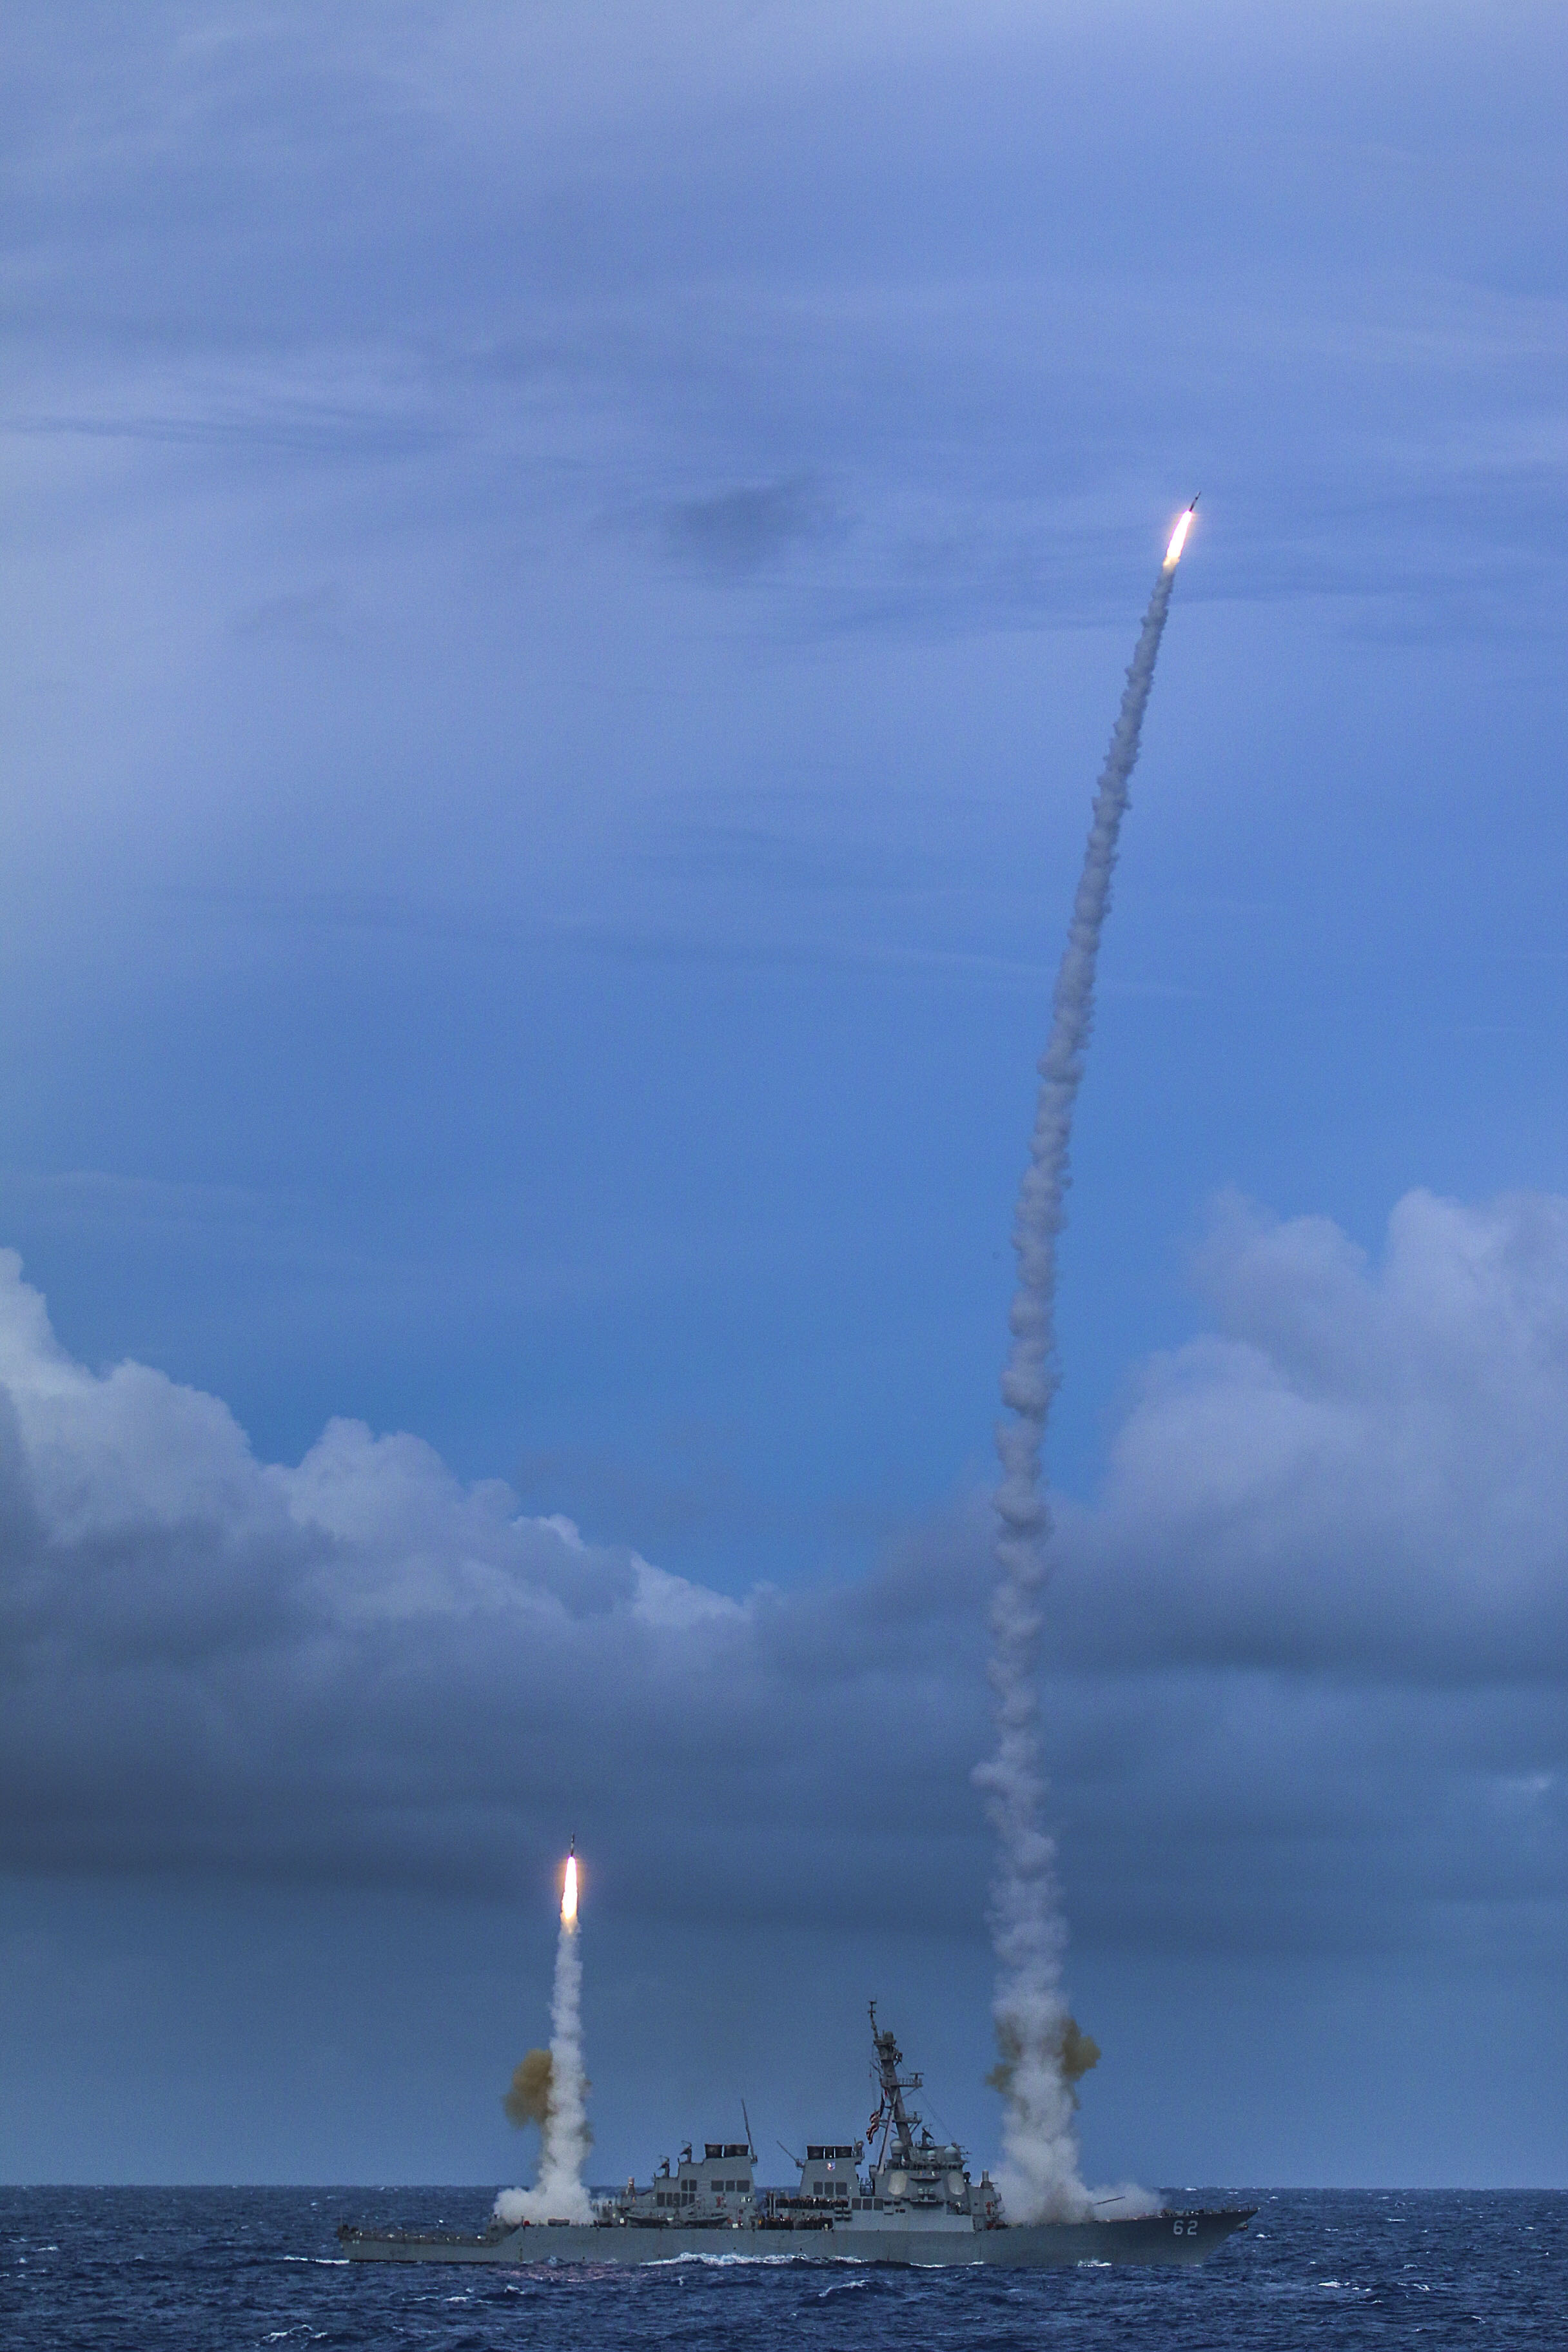 USS FITZGERALD DDG-62 Raketenabschuss am 15.09.2014 Bild: U.S. Navy